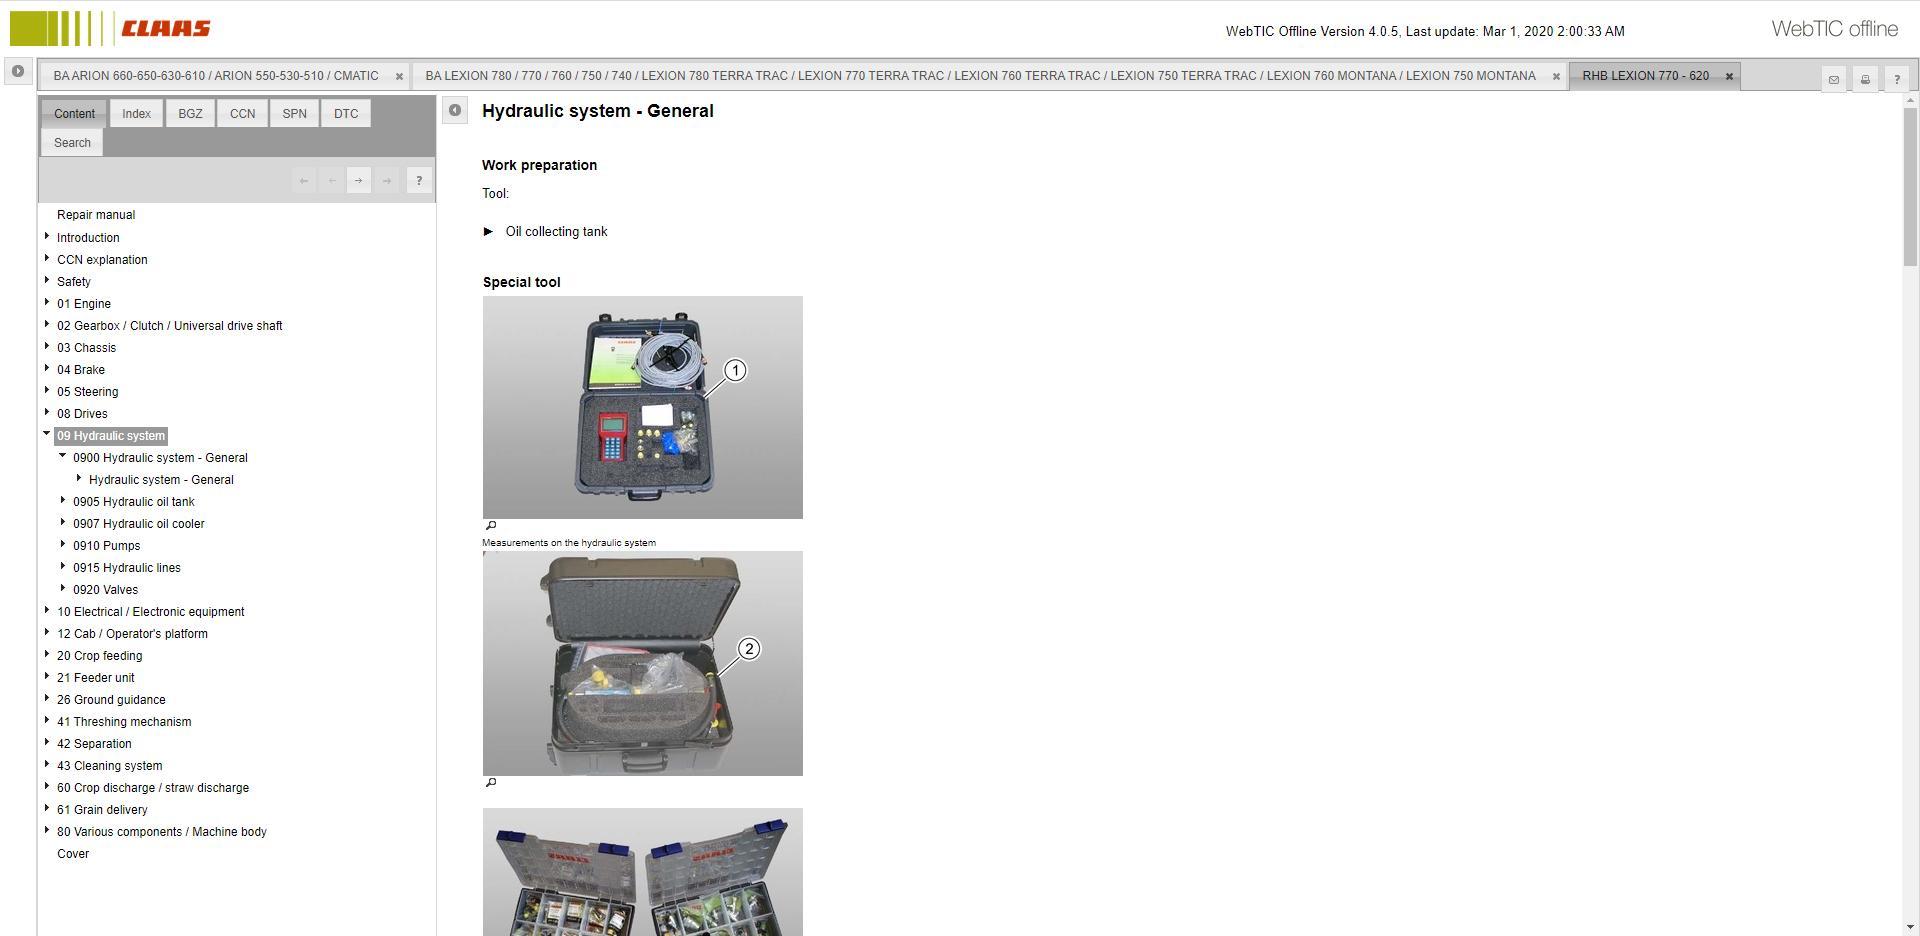 MasseyFerguson 354 364 374 384 394 Workshop Manual  Digital